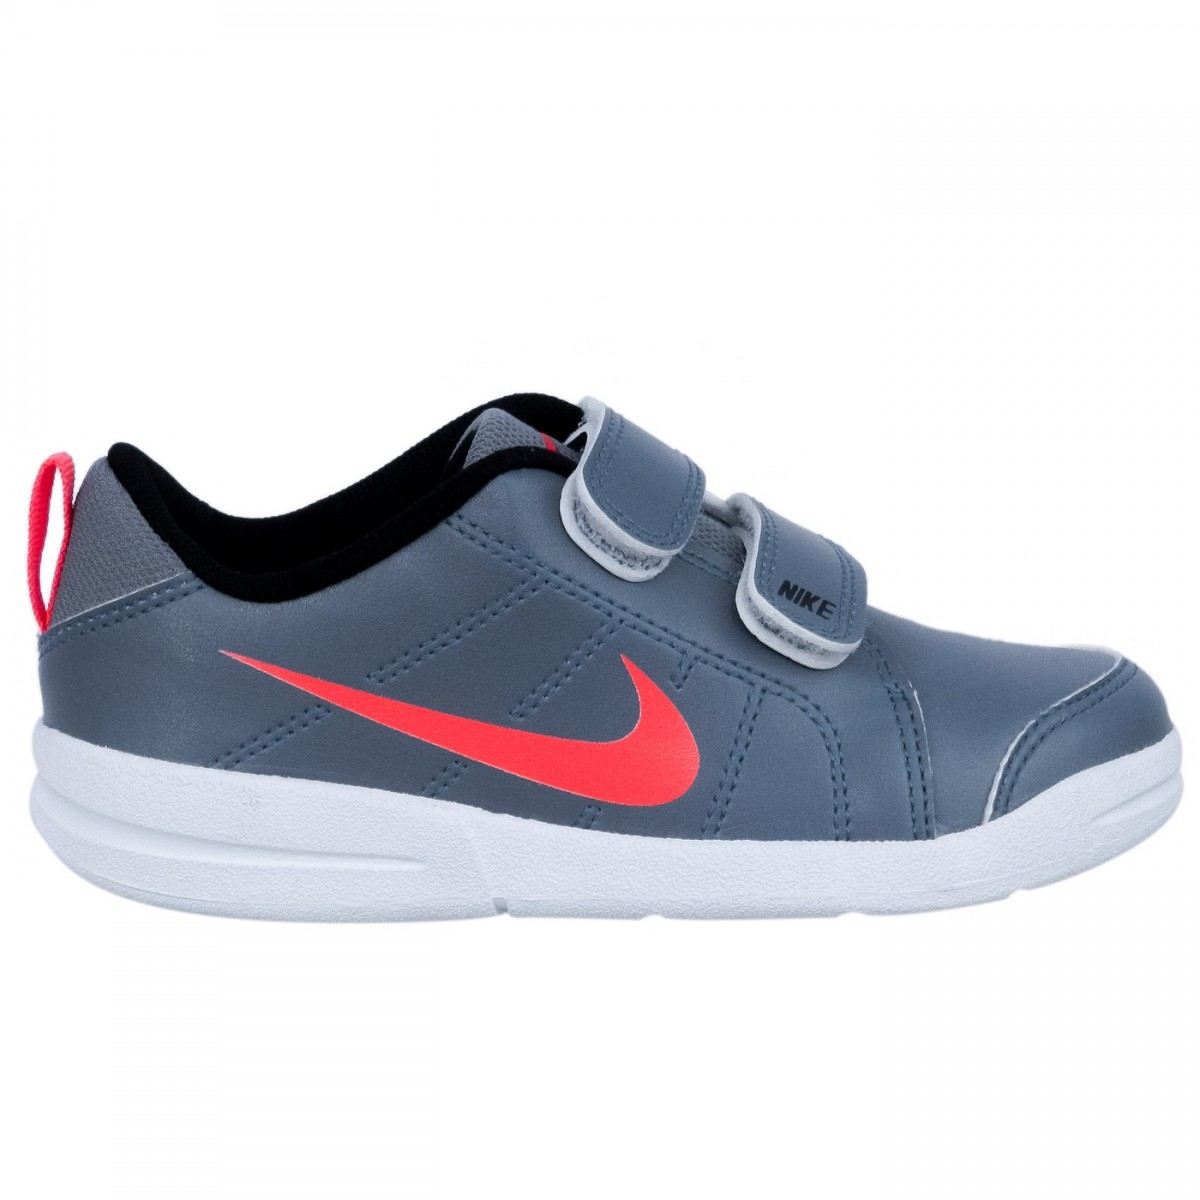 44760d8a64d Bizz Store - Tênis Infantil Masculino Nike Pico LT PSV Cinza